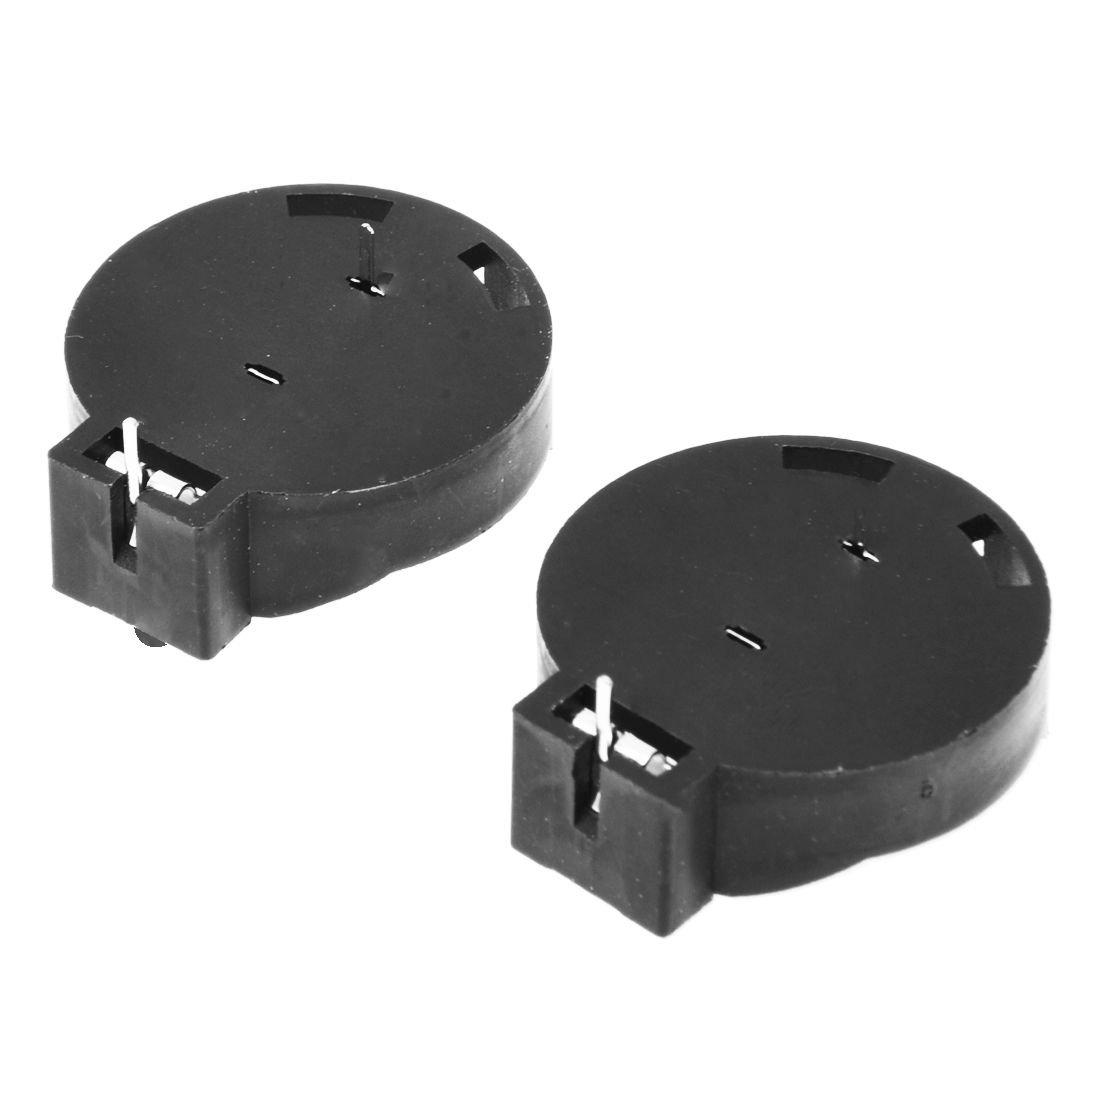 TOOGOO(R) 2 Pcs CR2450 Coin Cell Button Battery Socket Holder Case 2 Pins Black